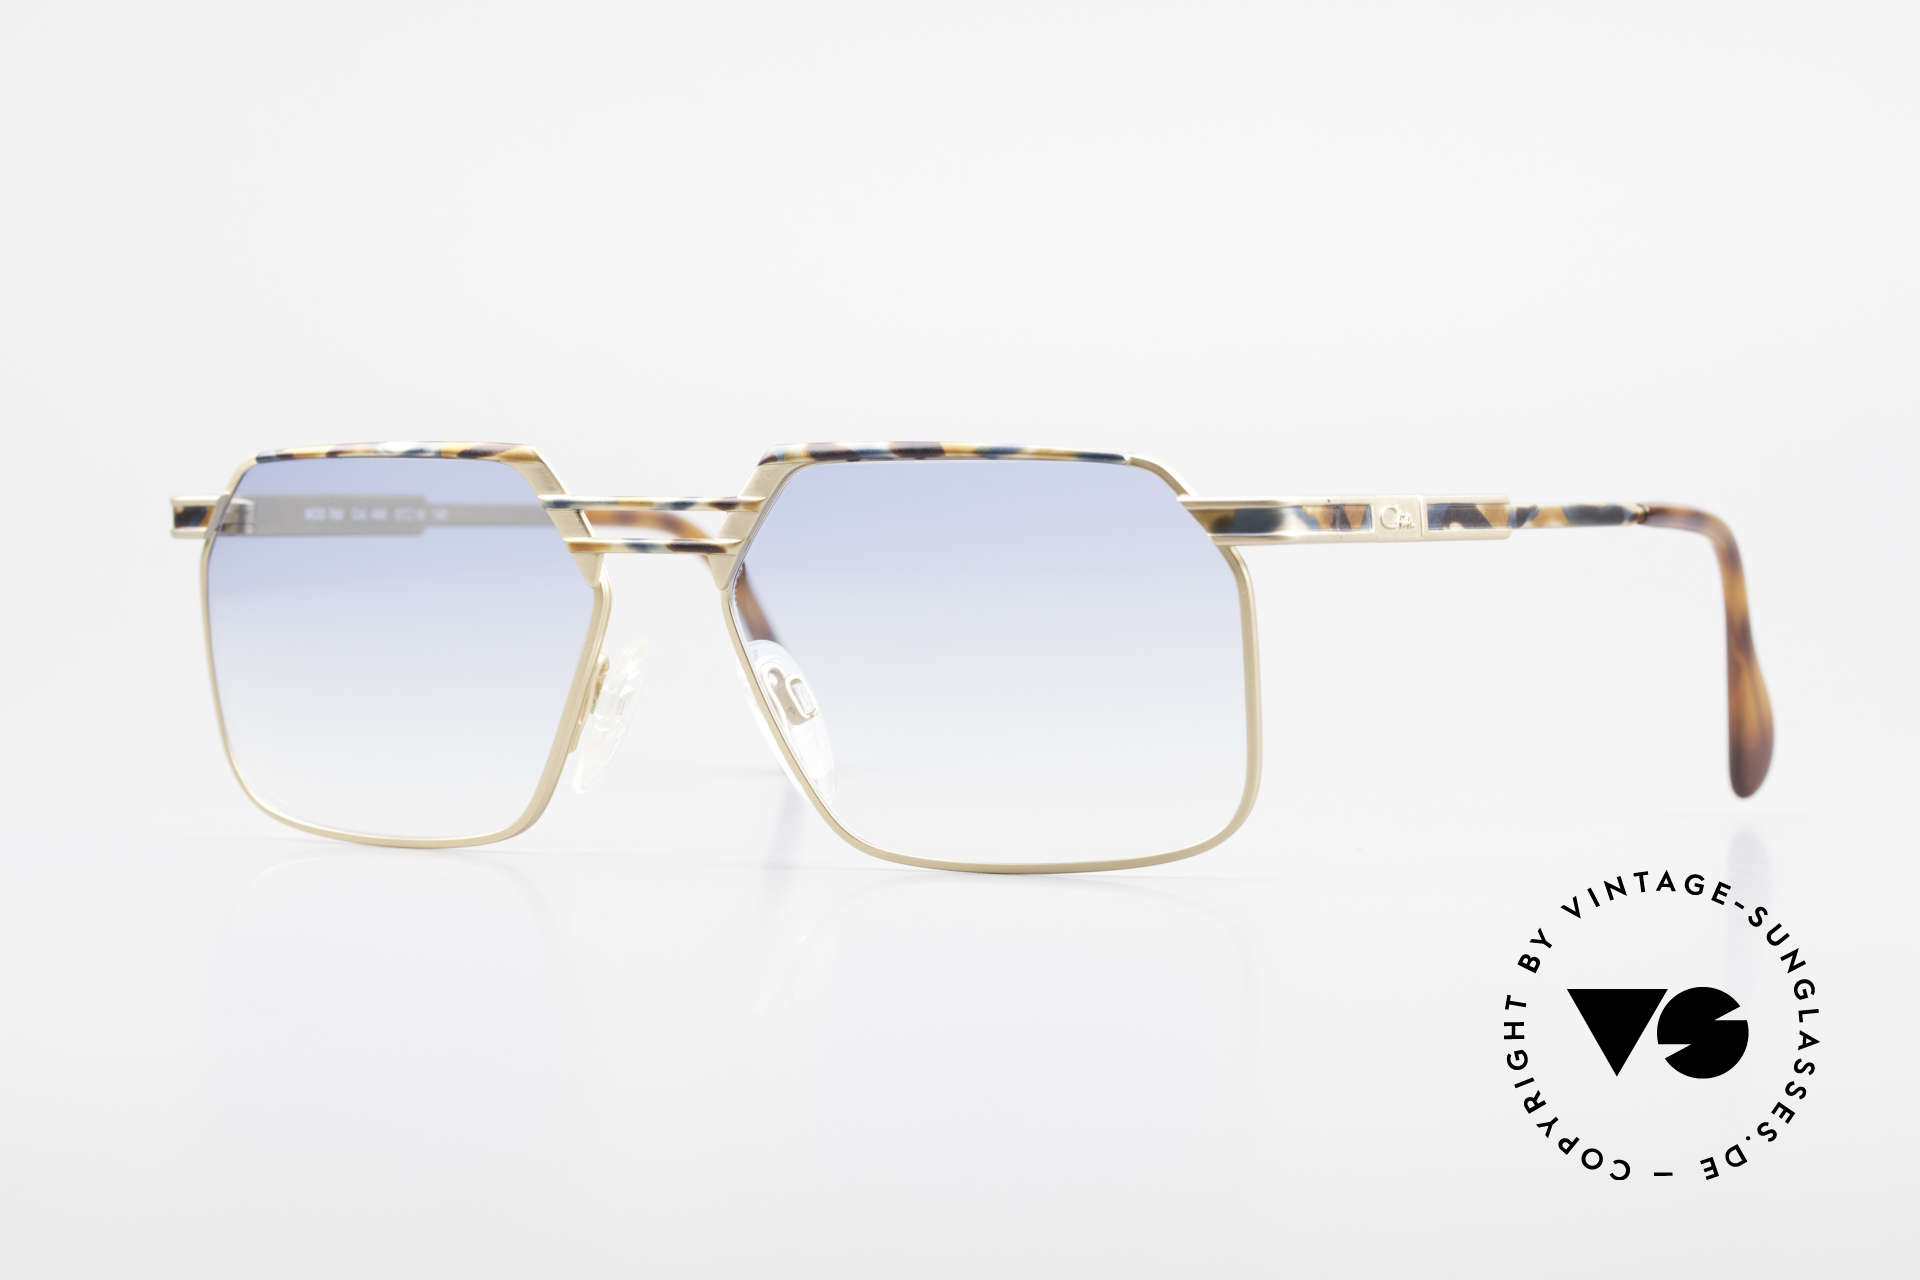 Cazal 760 True Vintage Men's Sunglasses, expressive Cazal shades for men from 1993/94, Made for Men